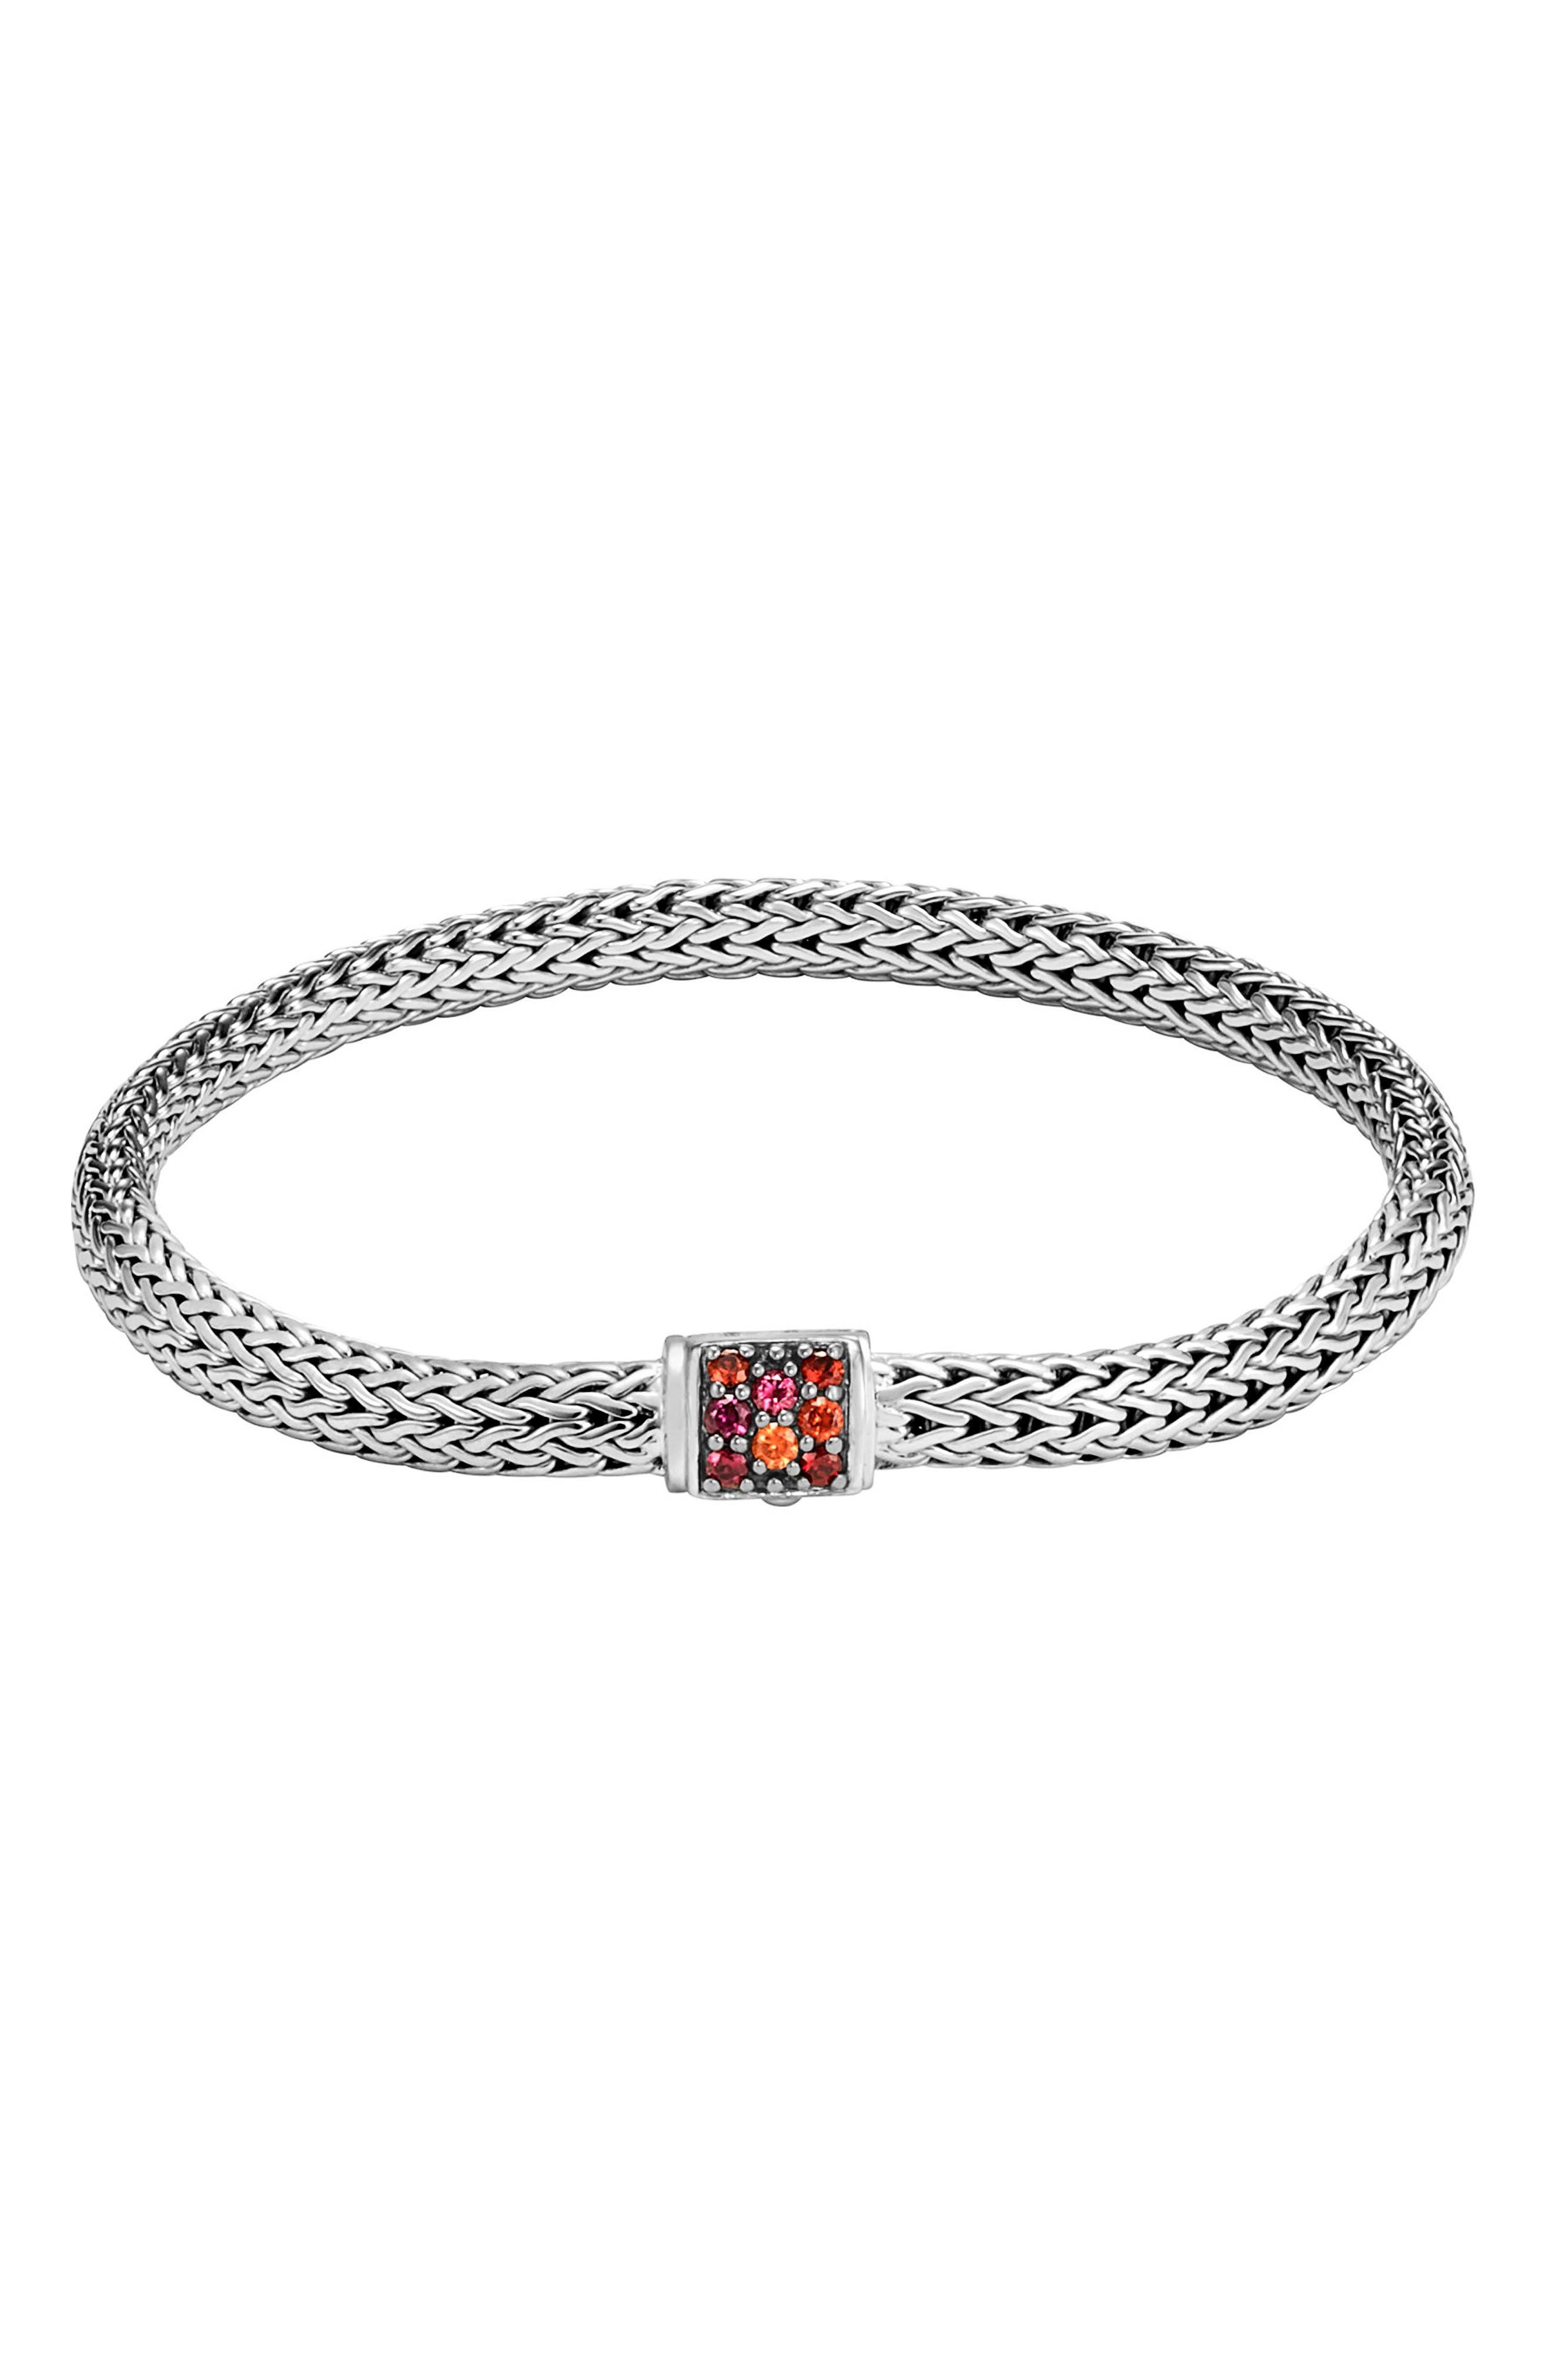 Main Image - John Hardy Classic Chain Extra Small Bracelet